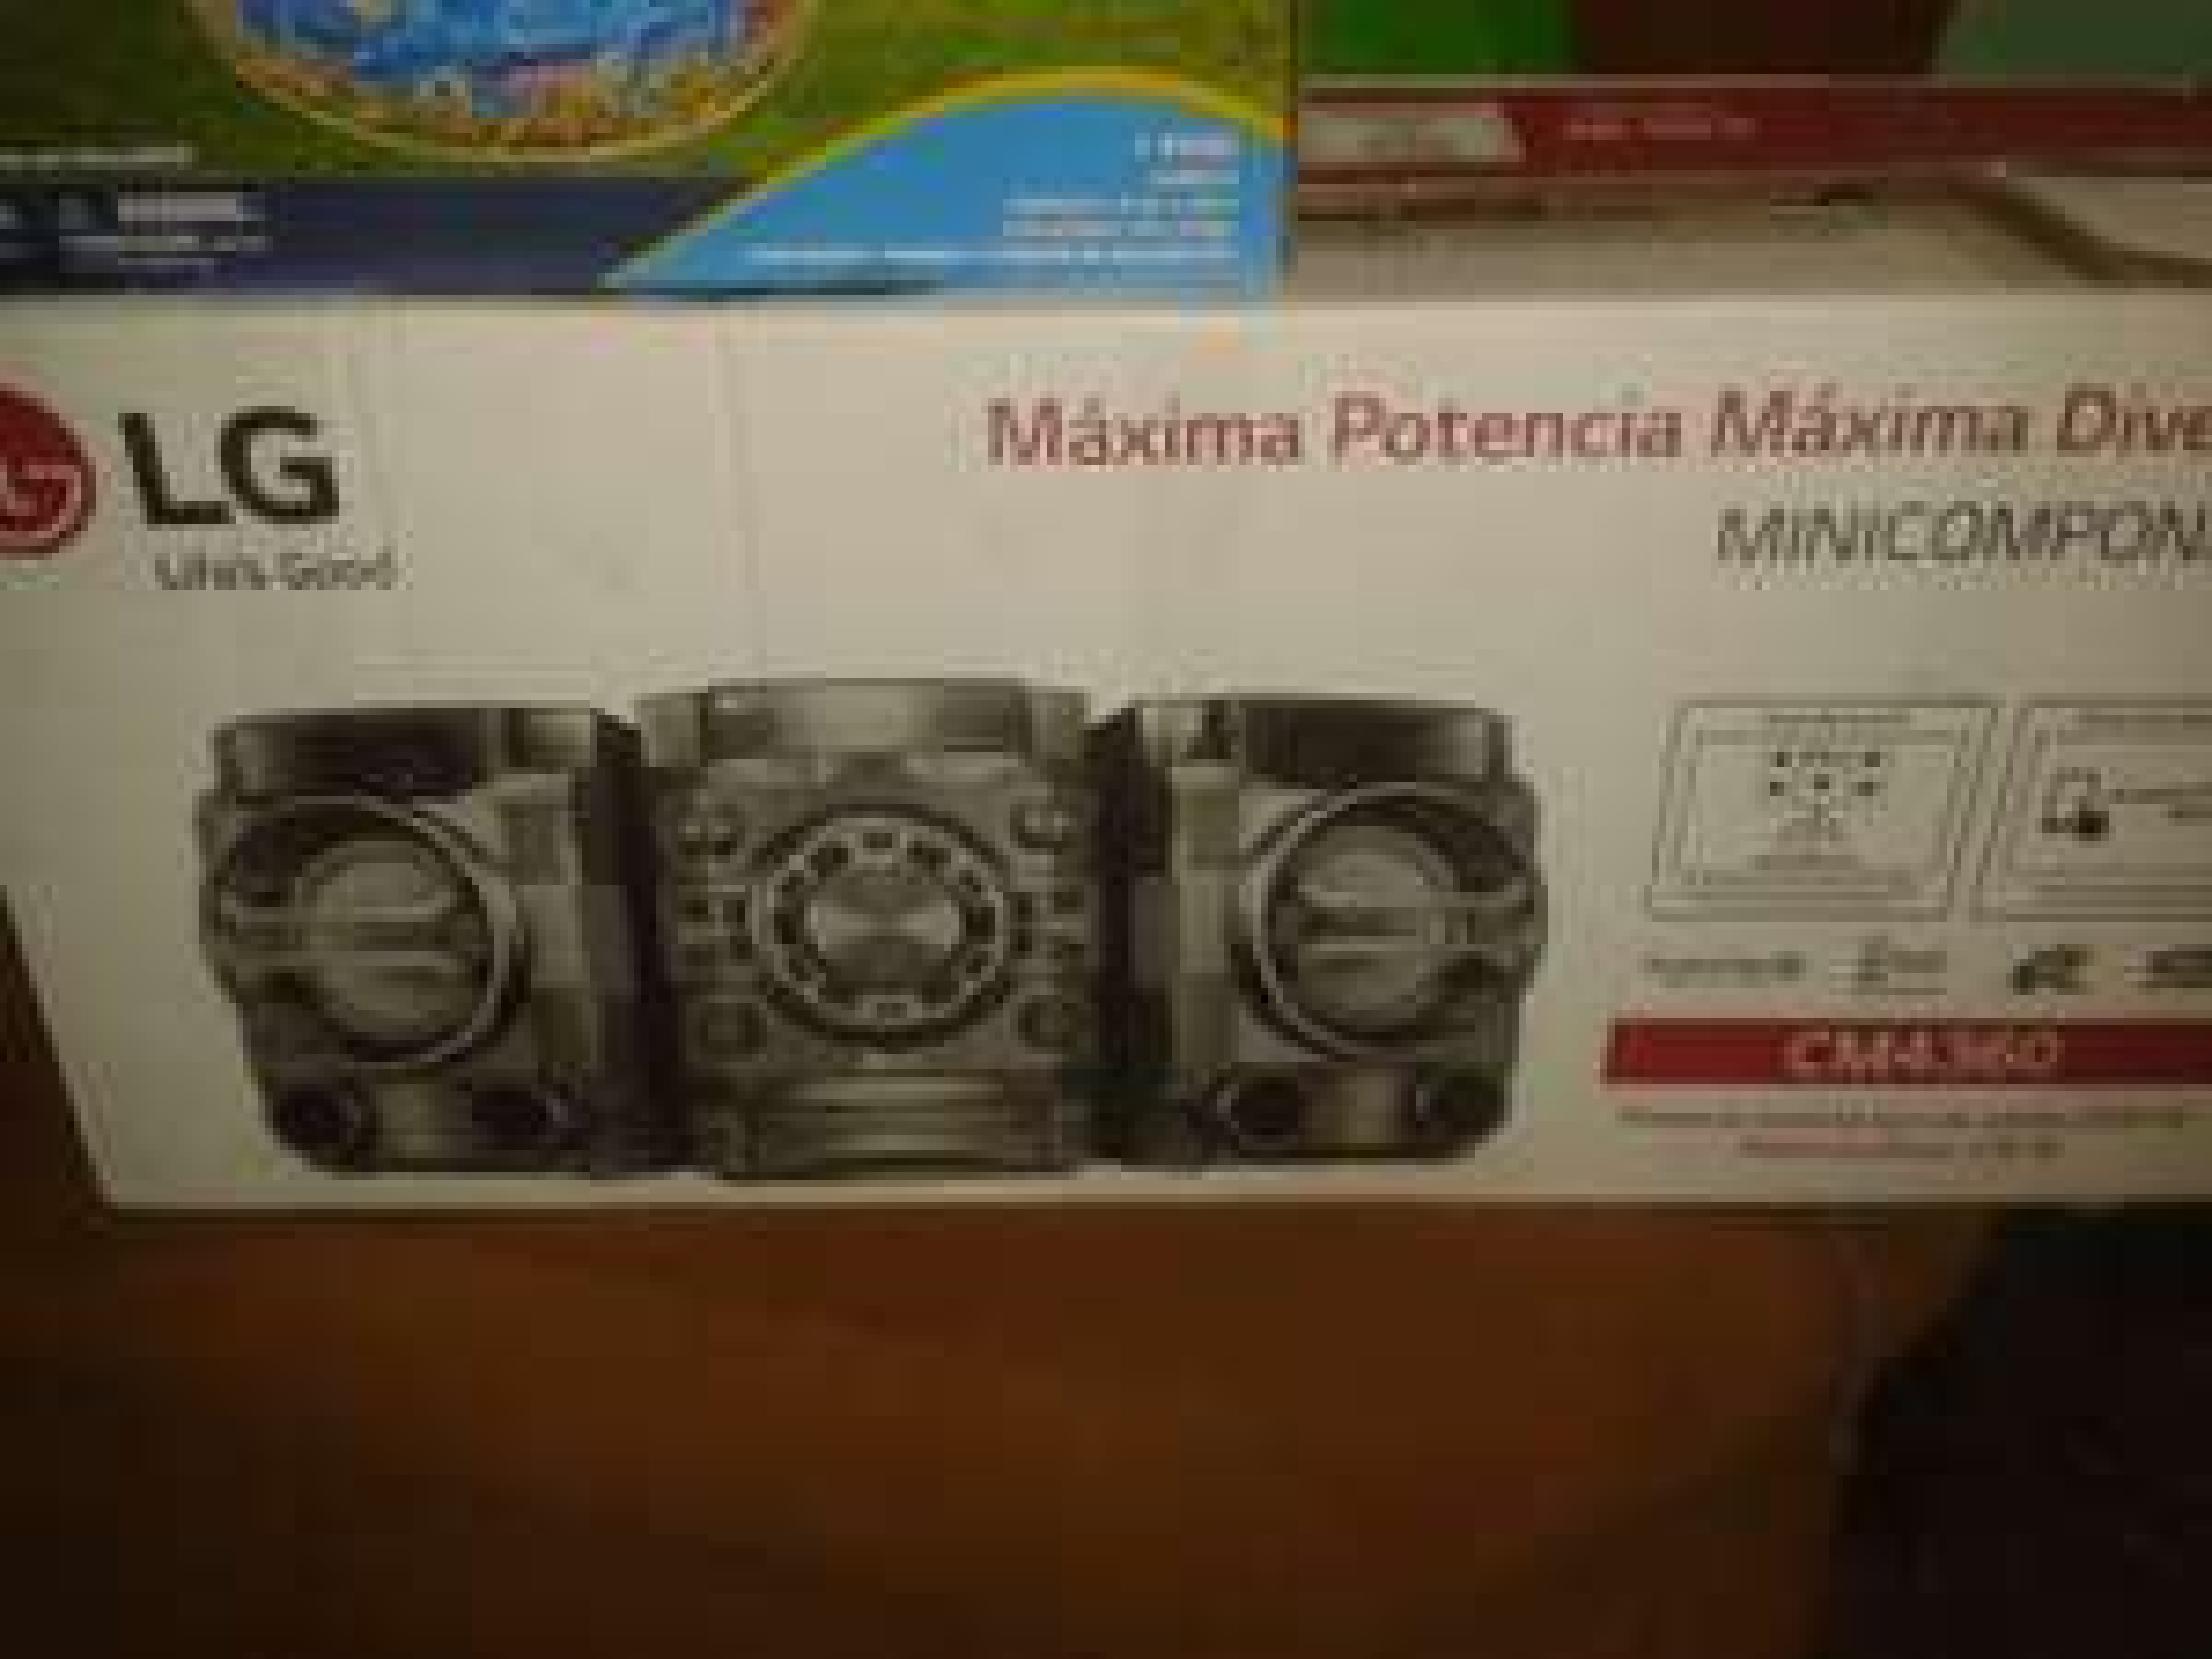 Bodega Aurrerá: Minicomponente LG CM4360 a $1,195.01